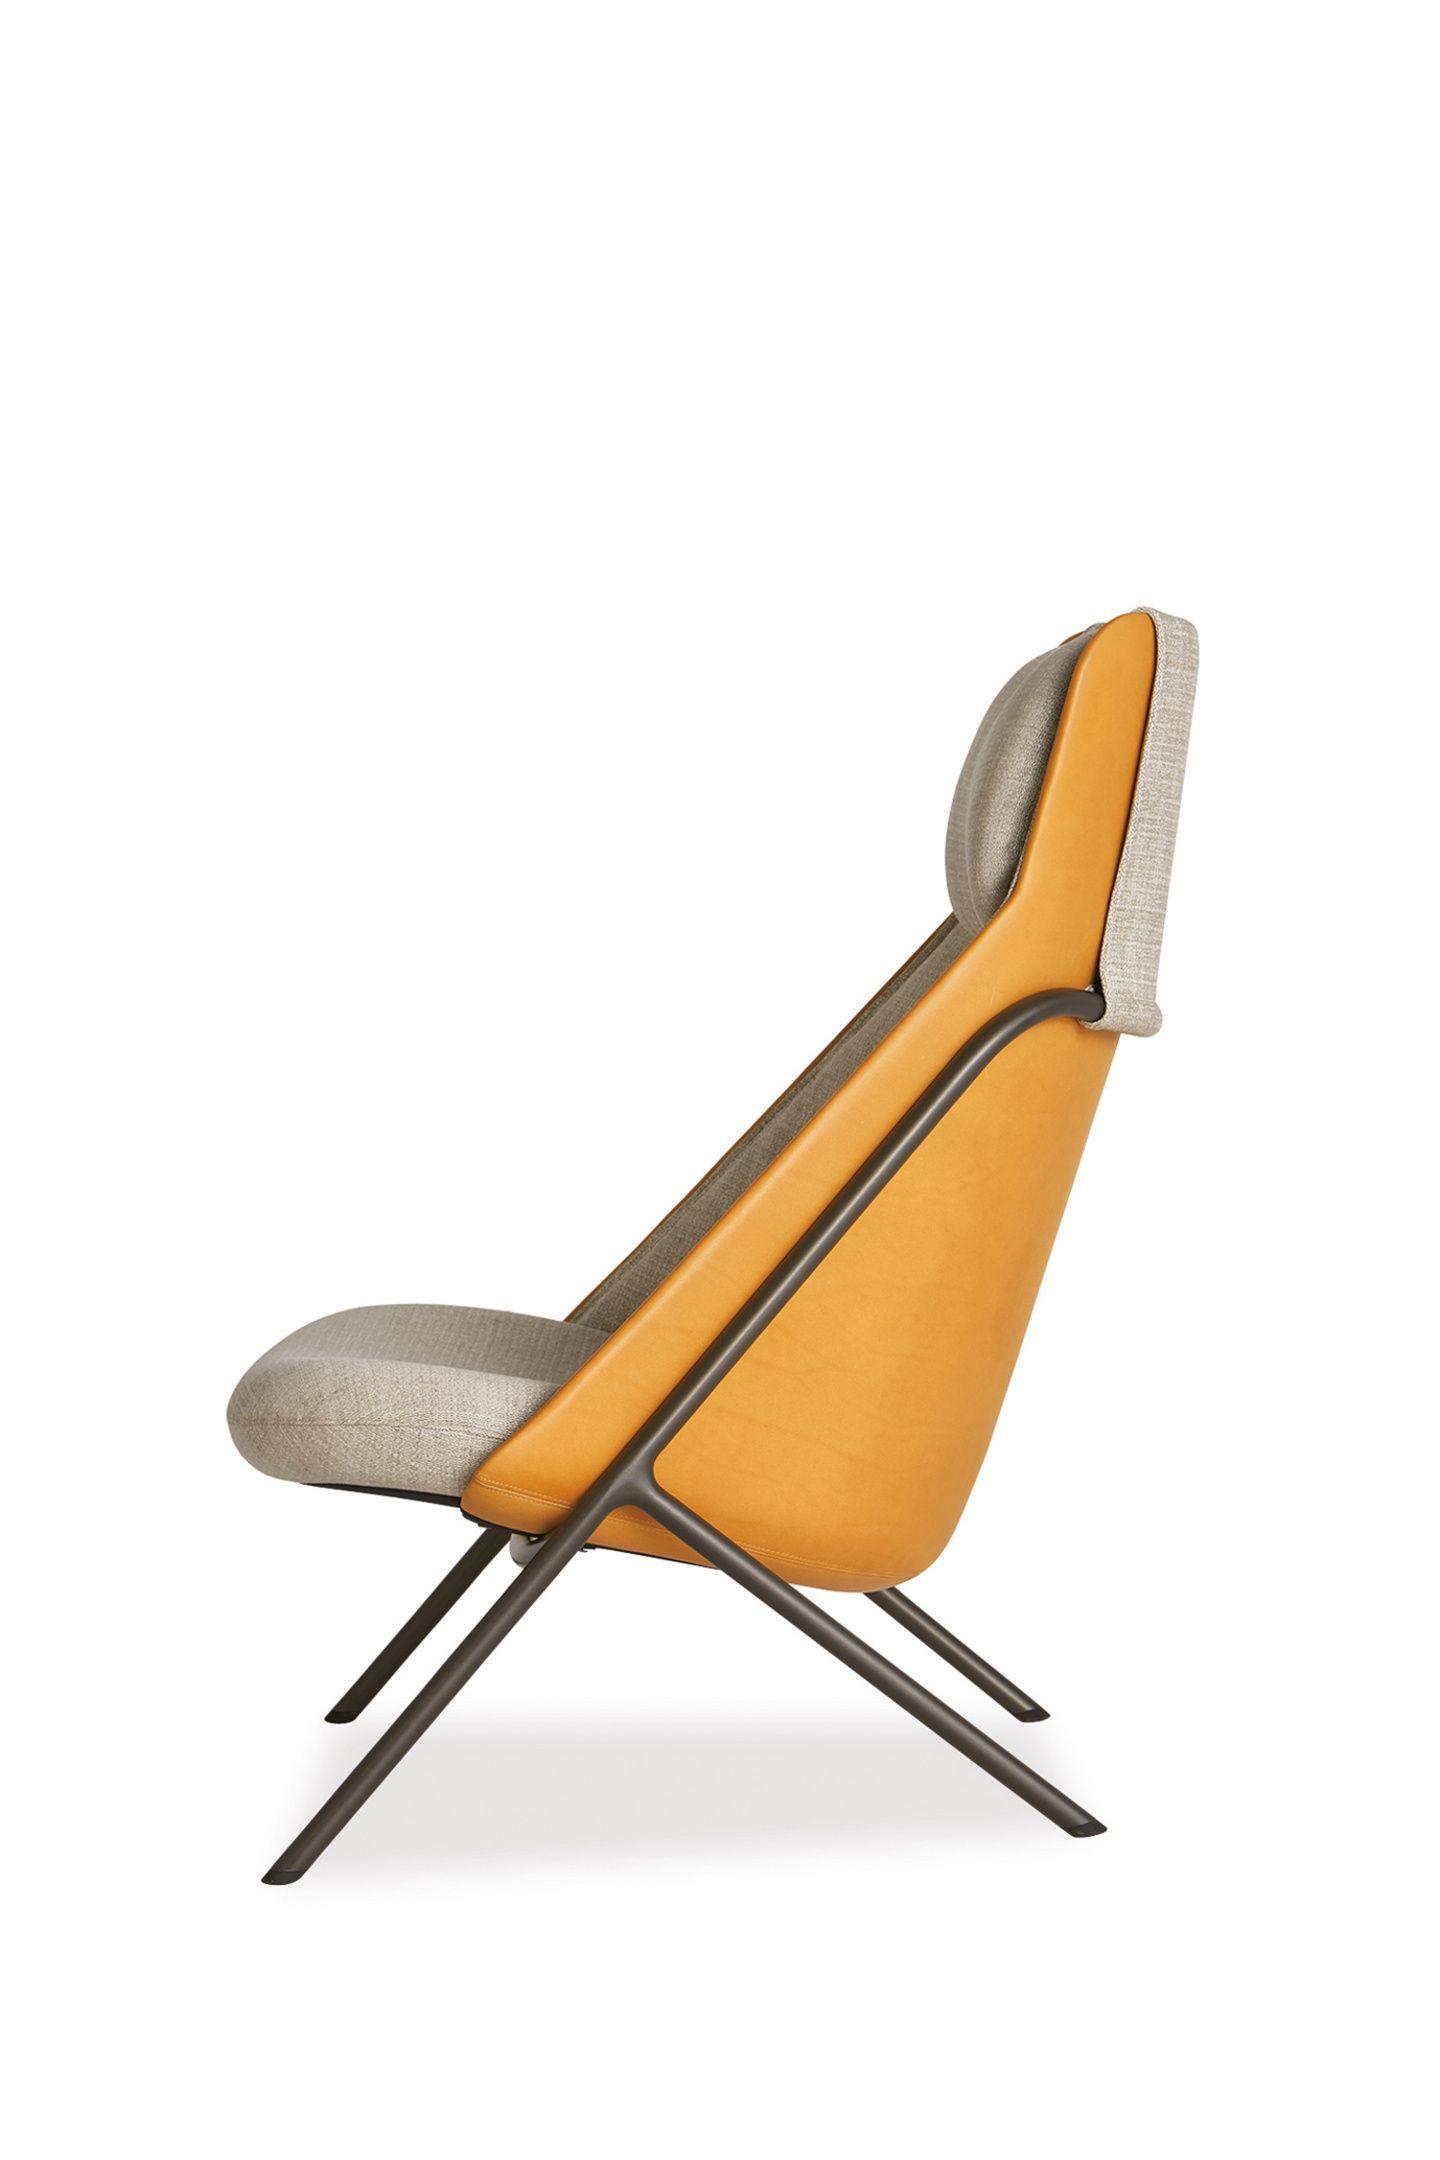 Interesting furniture design i décor aid interior pinterest